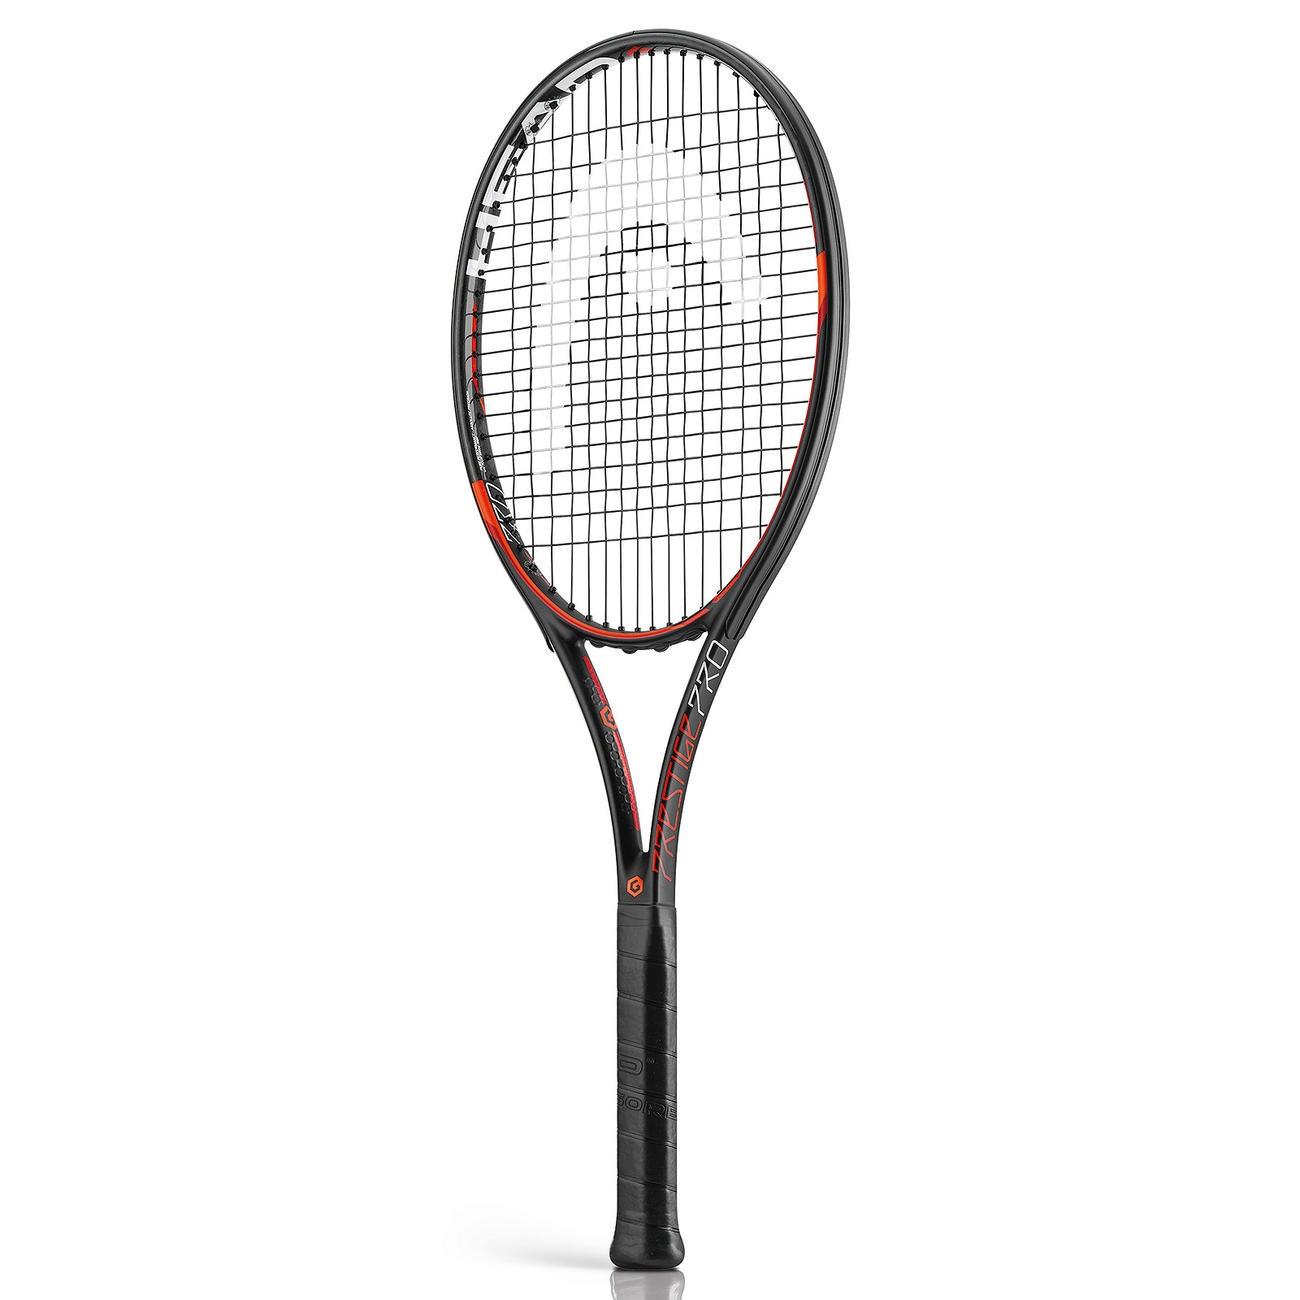 Rakieta tenisowa Head Graphene XT Prestige Pro